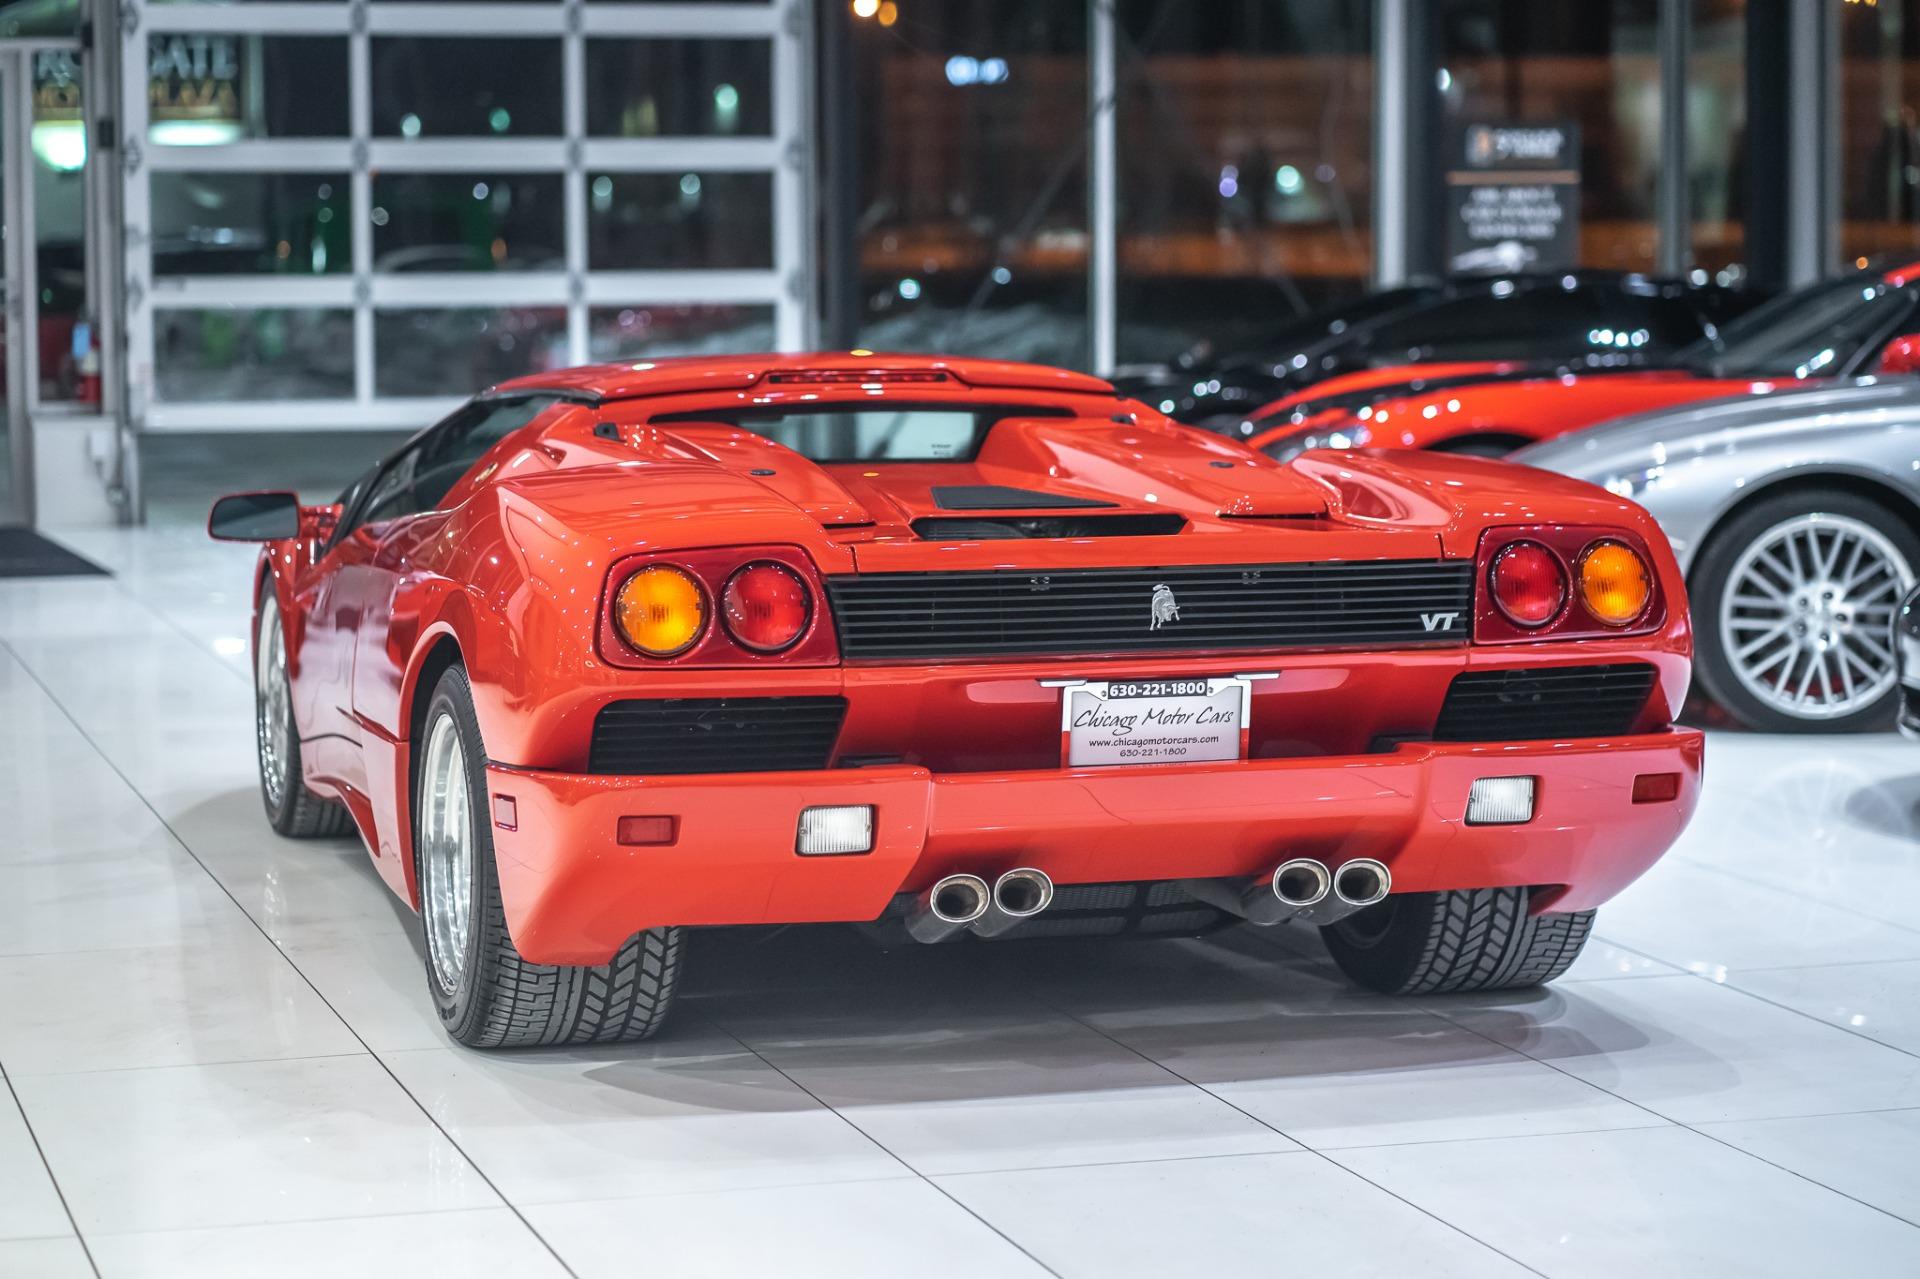 Used 1997 Lamborghini Diablo Vt Roadster 1 260 Miles For Sale